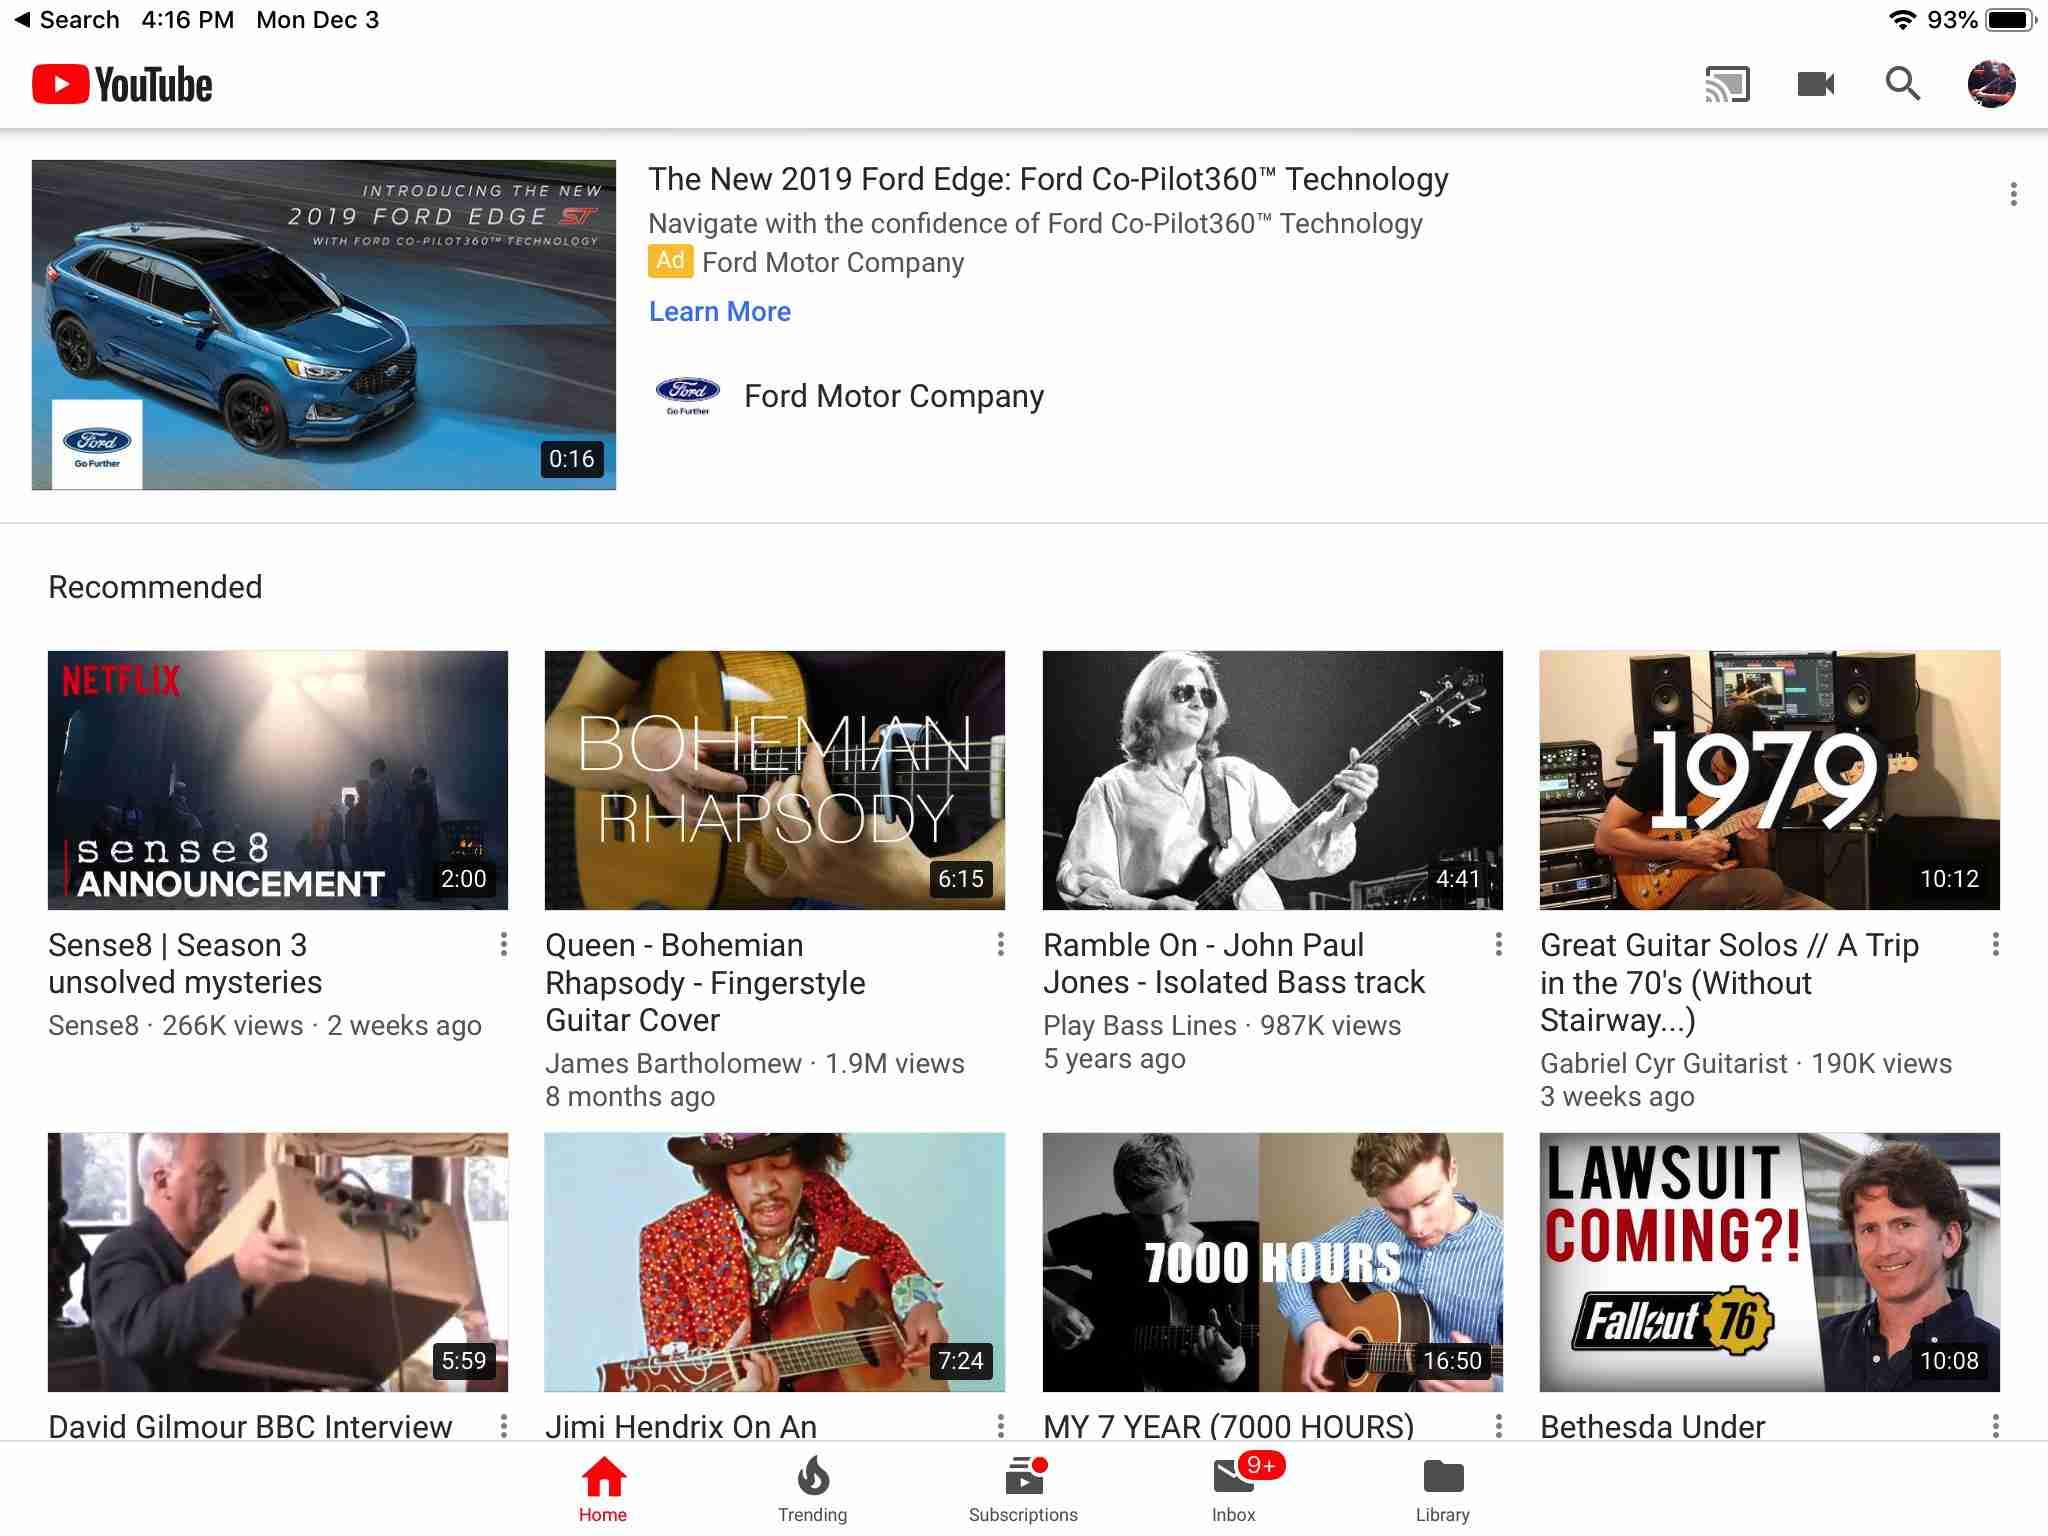 YouTube app screen on iPad